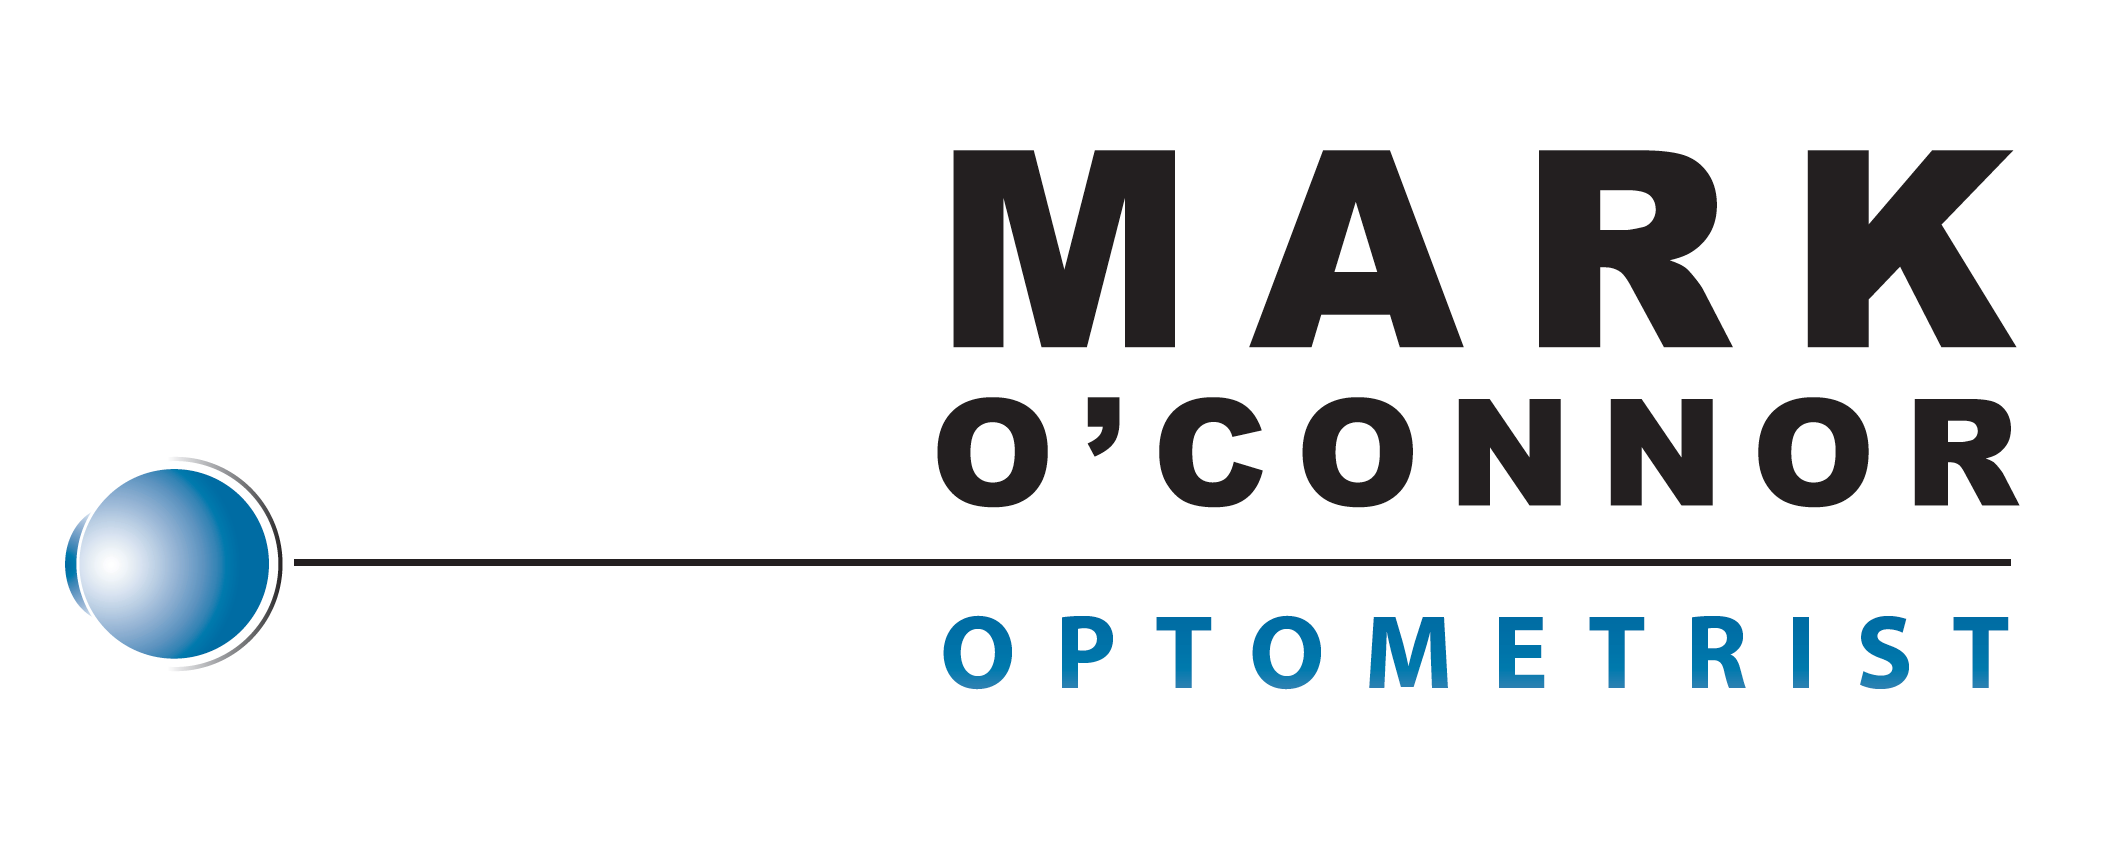 logo for Mark O'Connor Optometrist - Marden Optometrists